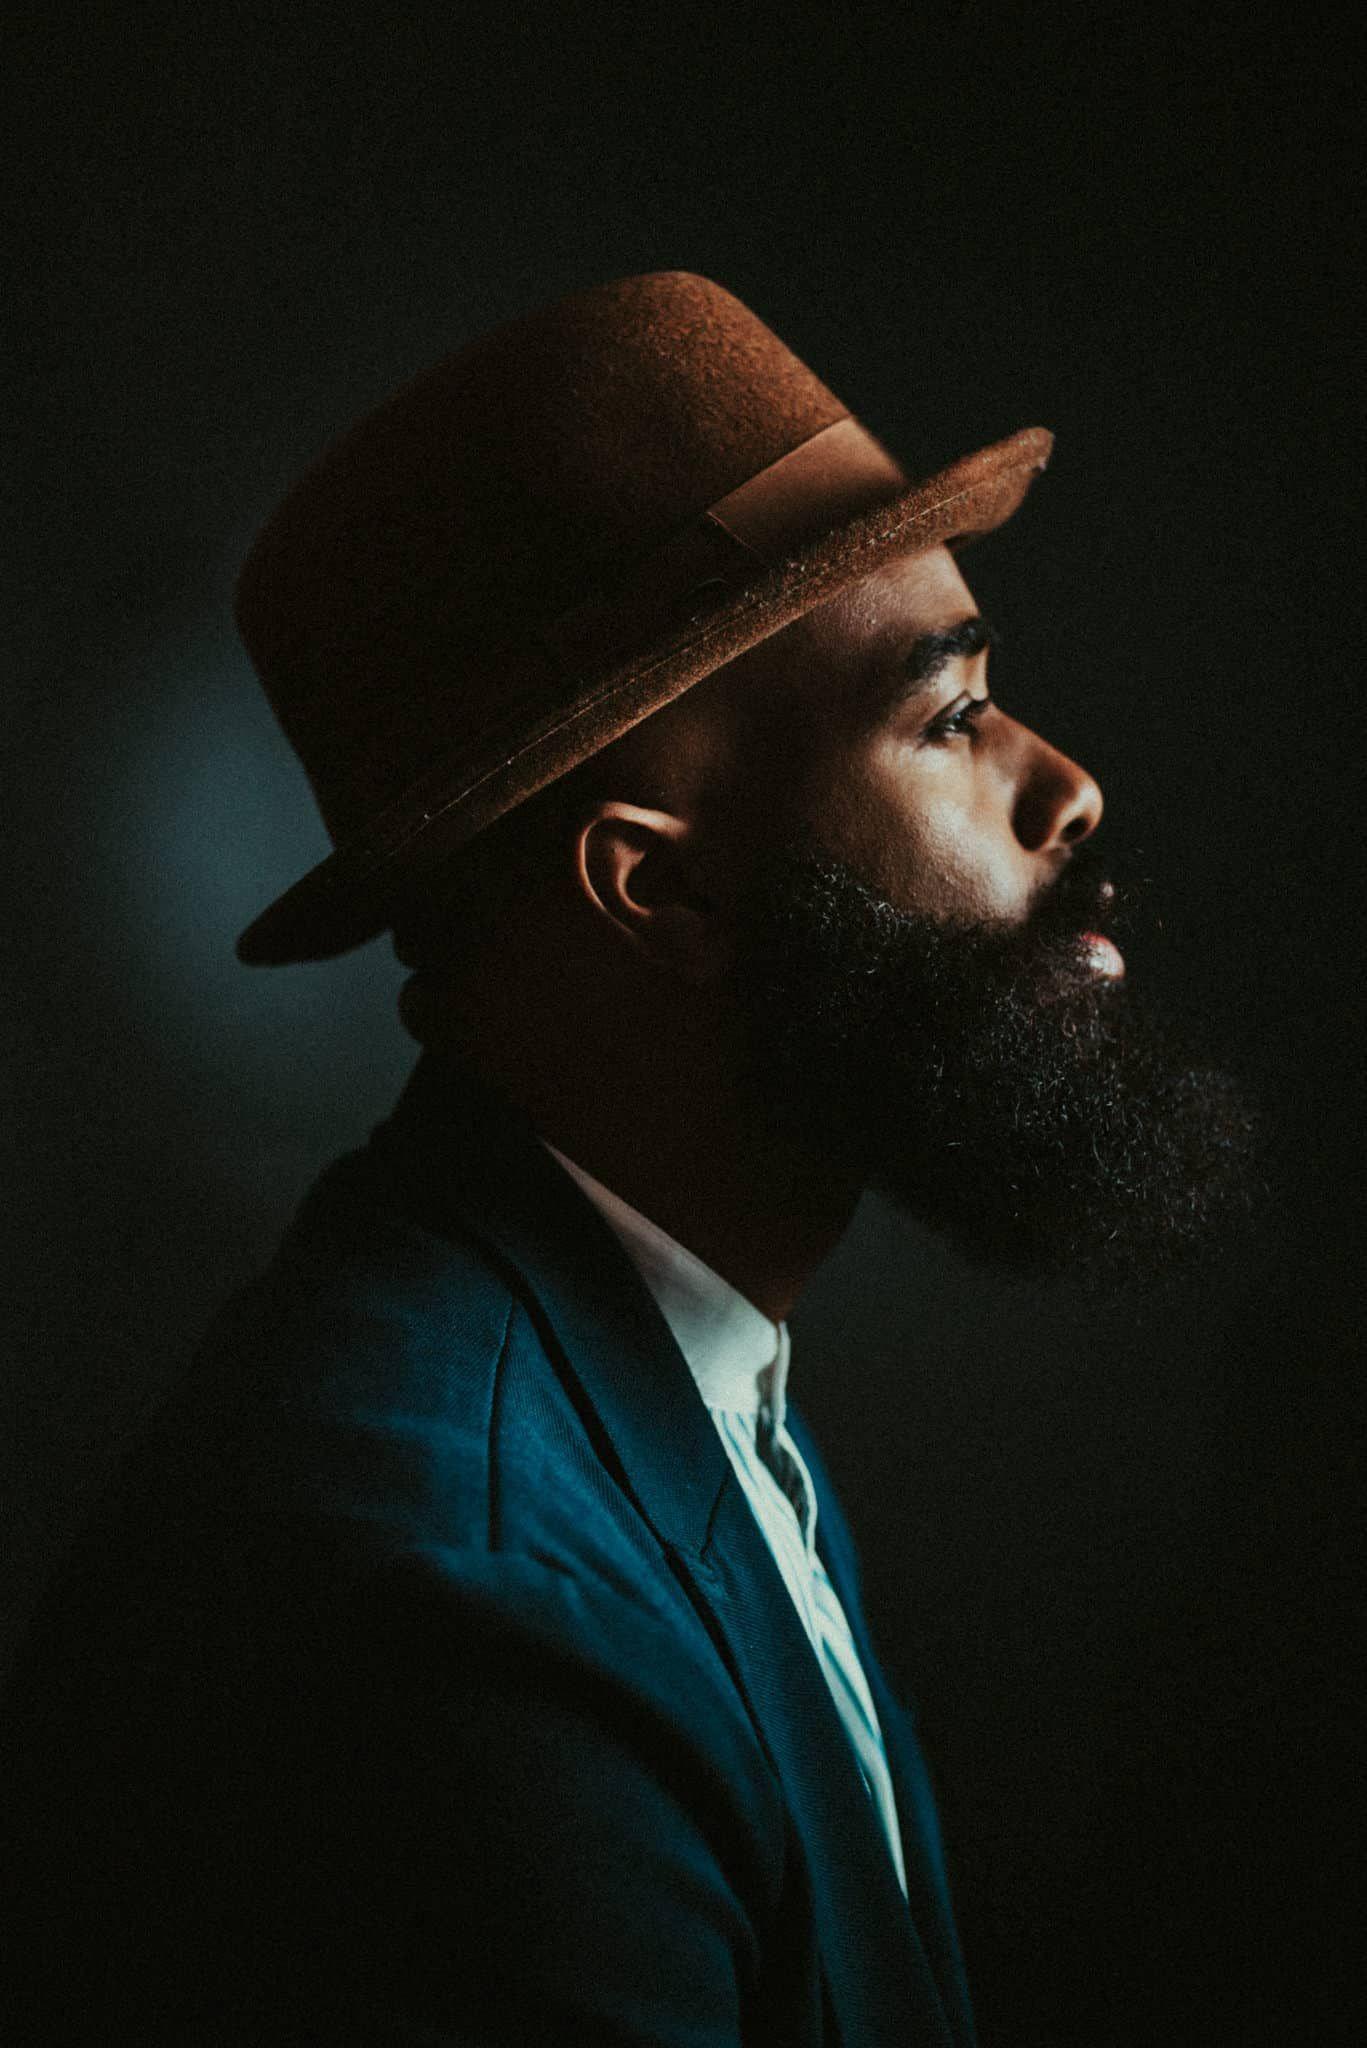 Studio Photography  men portraits | lifestyle portraits | studio portraits | man in hat portraits | moody portraits